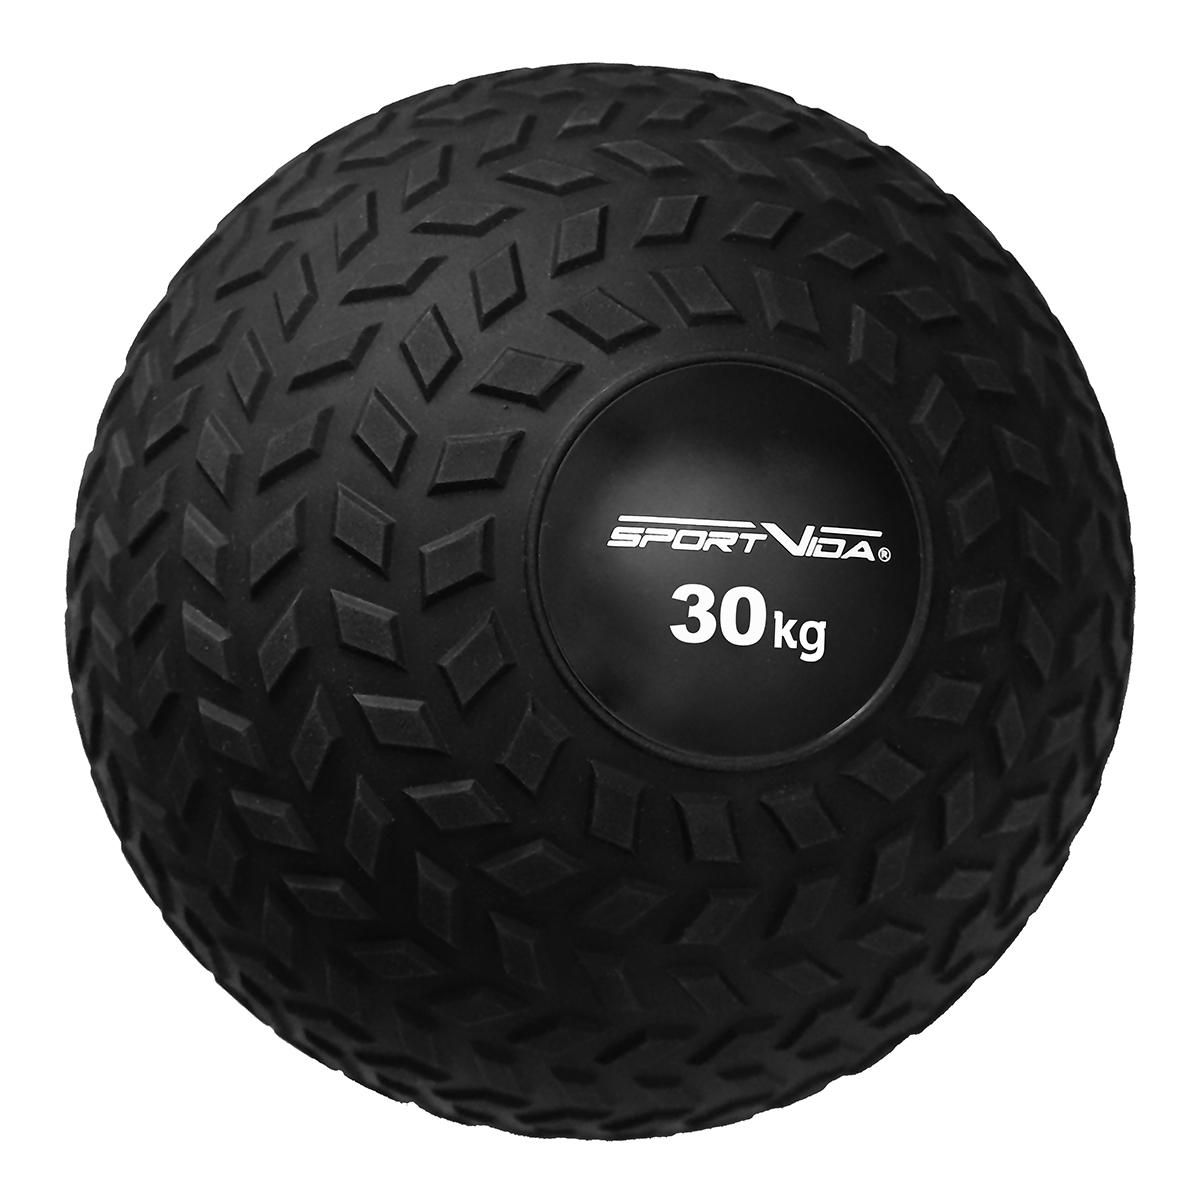 Piłka do ćwiczeń SLAM BALL 30 kg